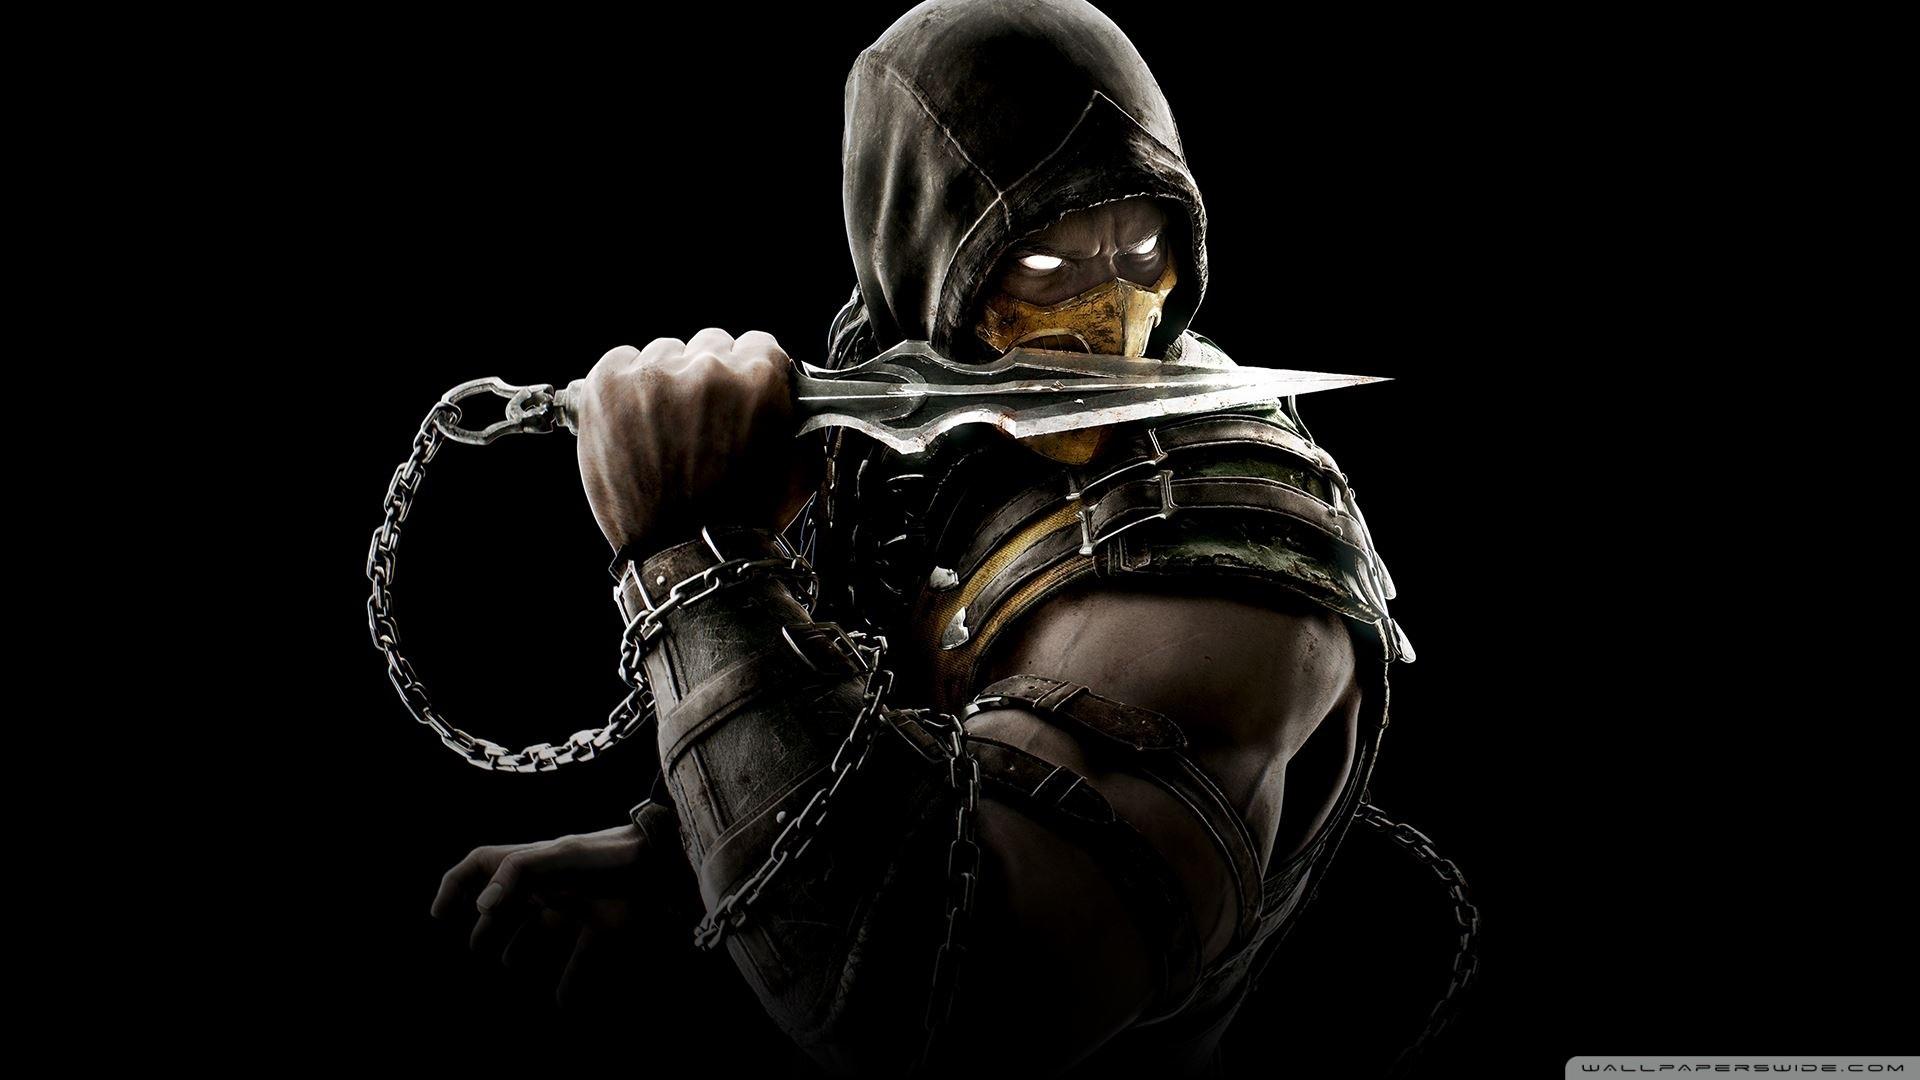 Mortal Kombat X Scorpion HD Wide Wallpaper for Widescreen